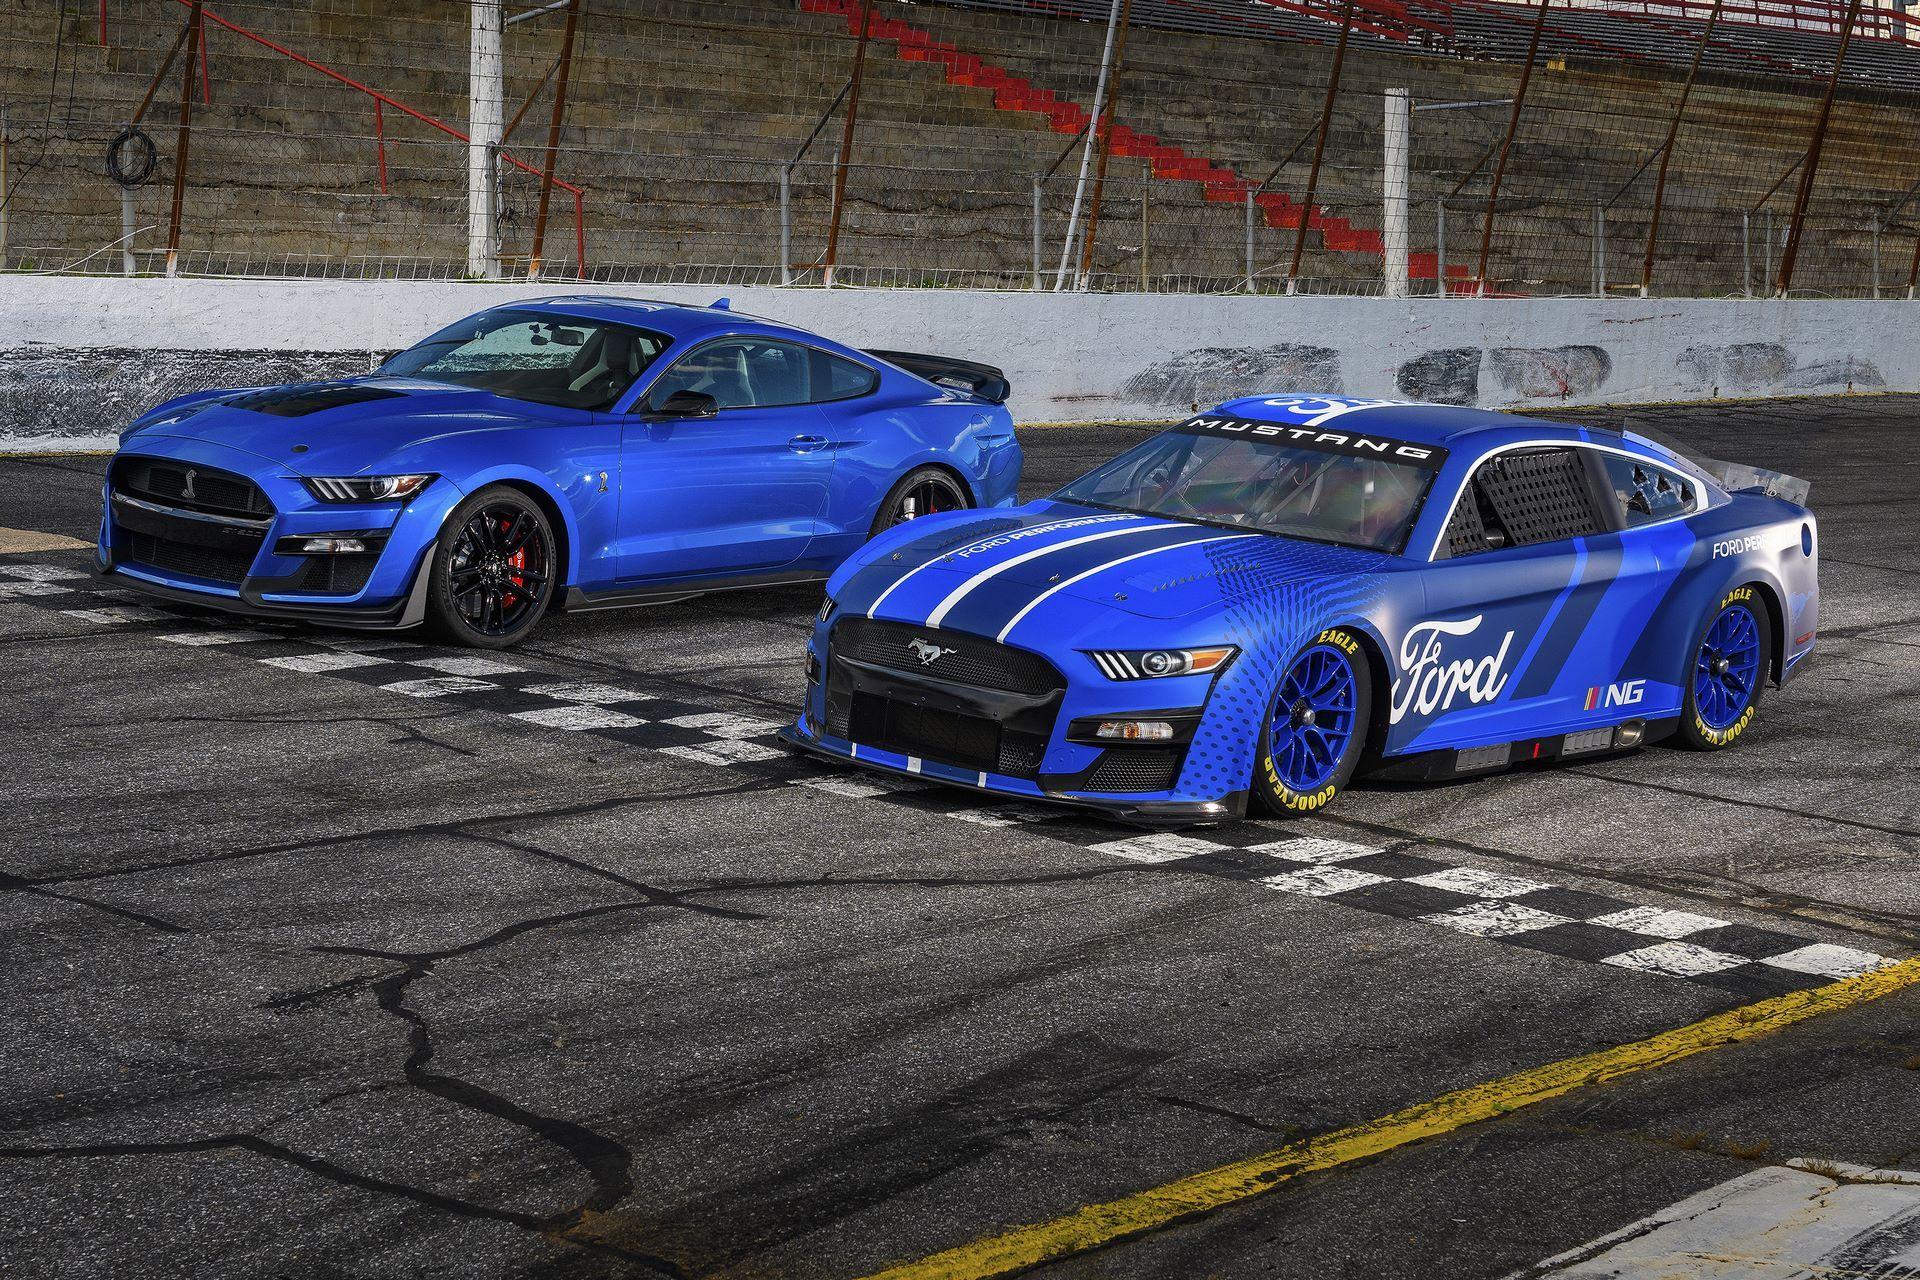 Ford-Mustang-Next-Gen-Nascar-11